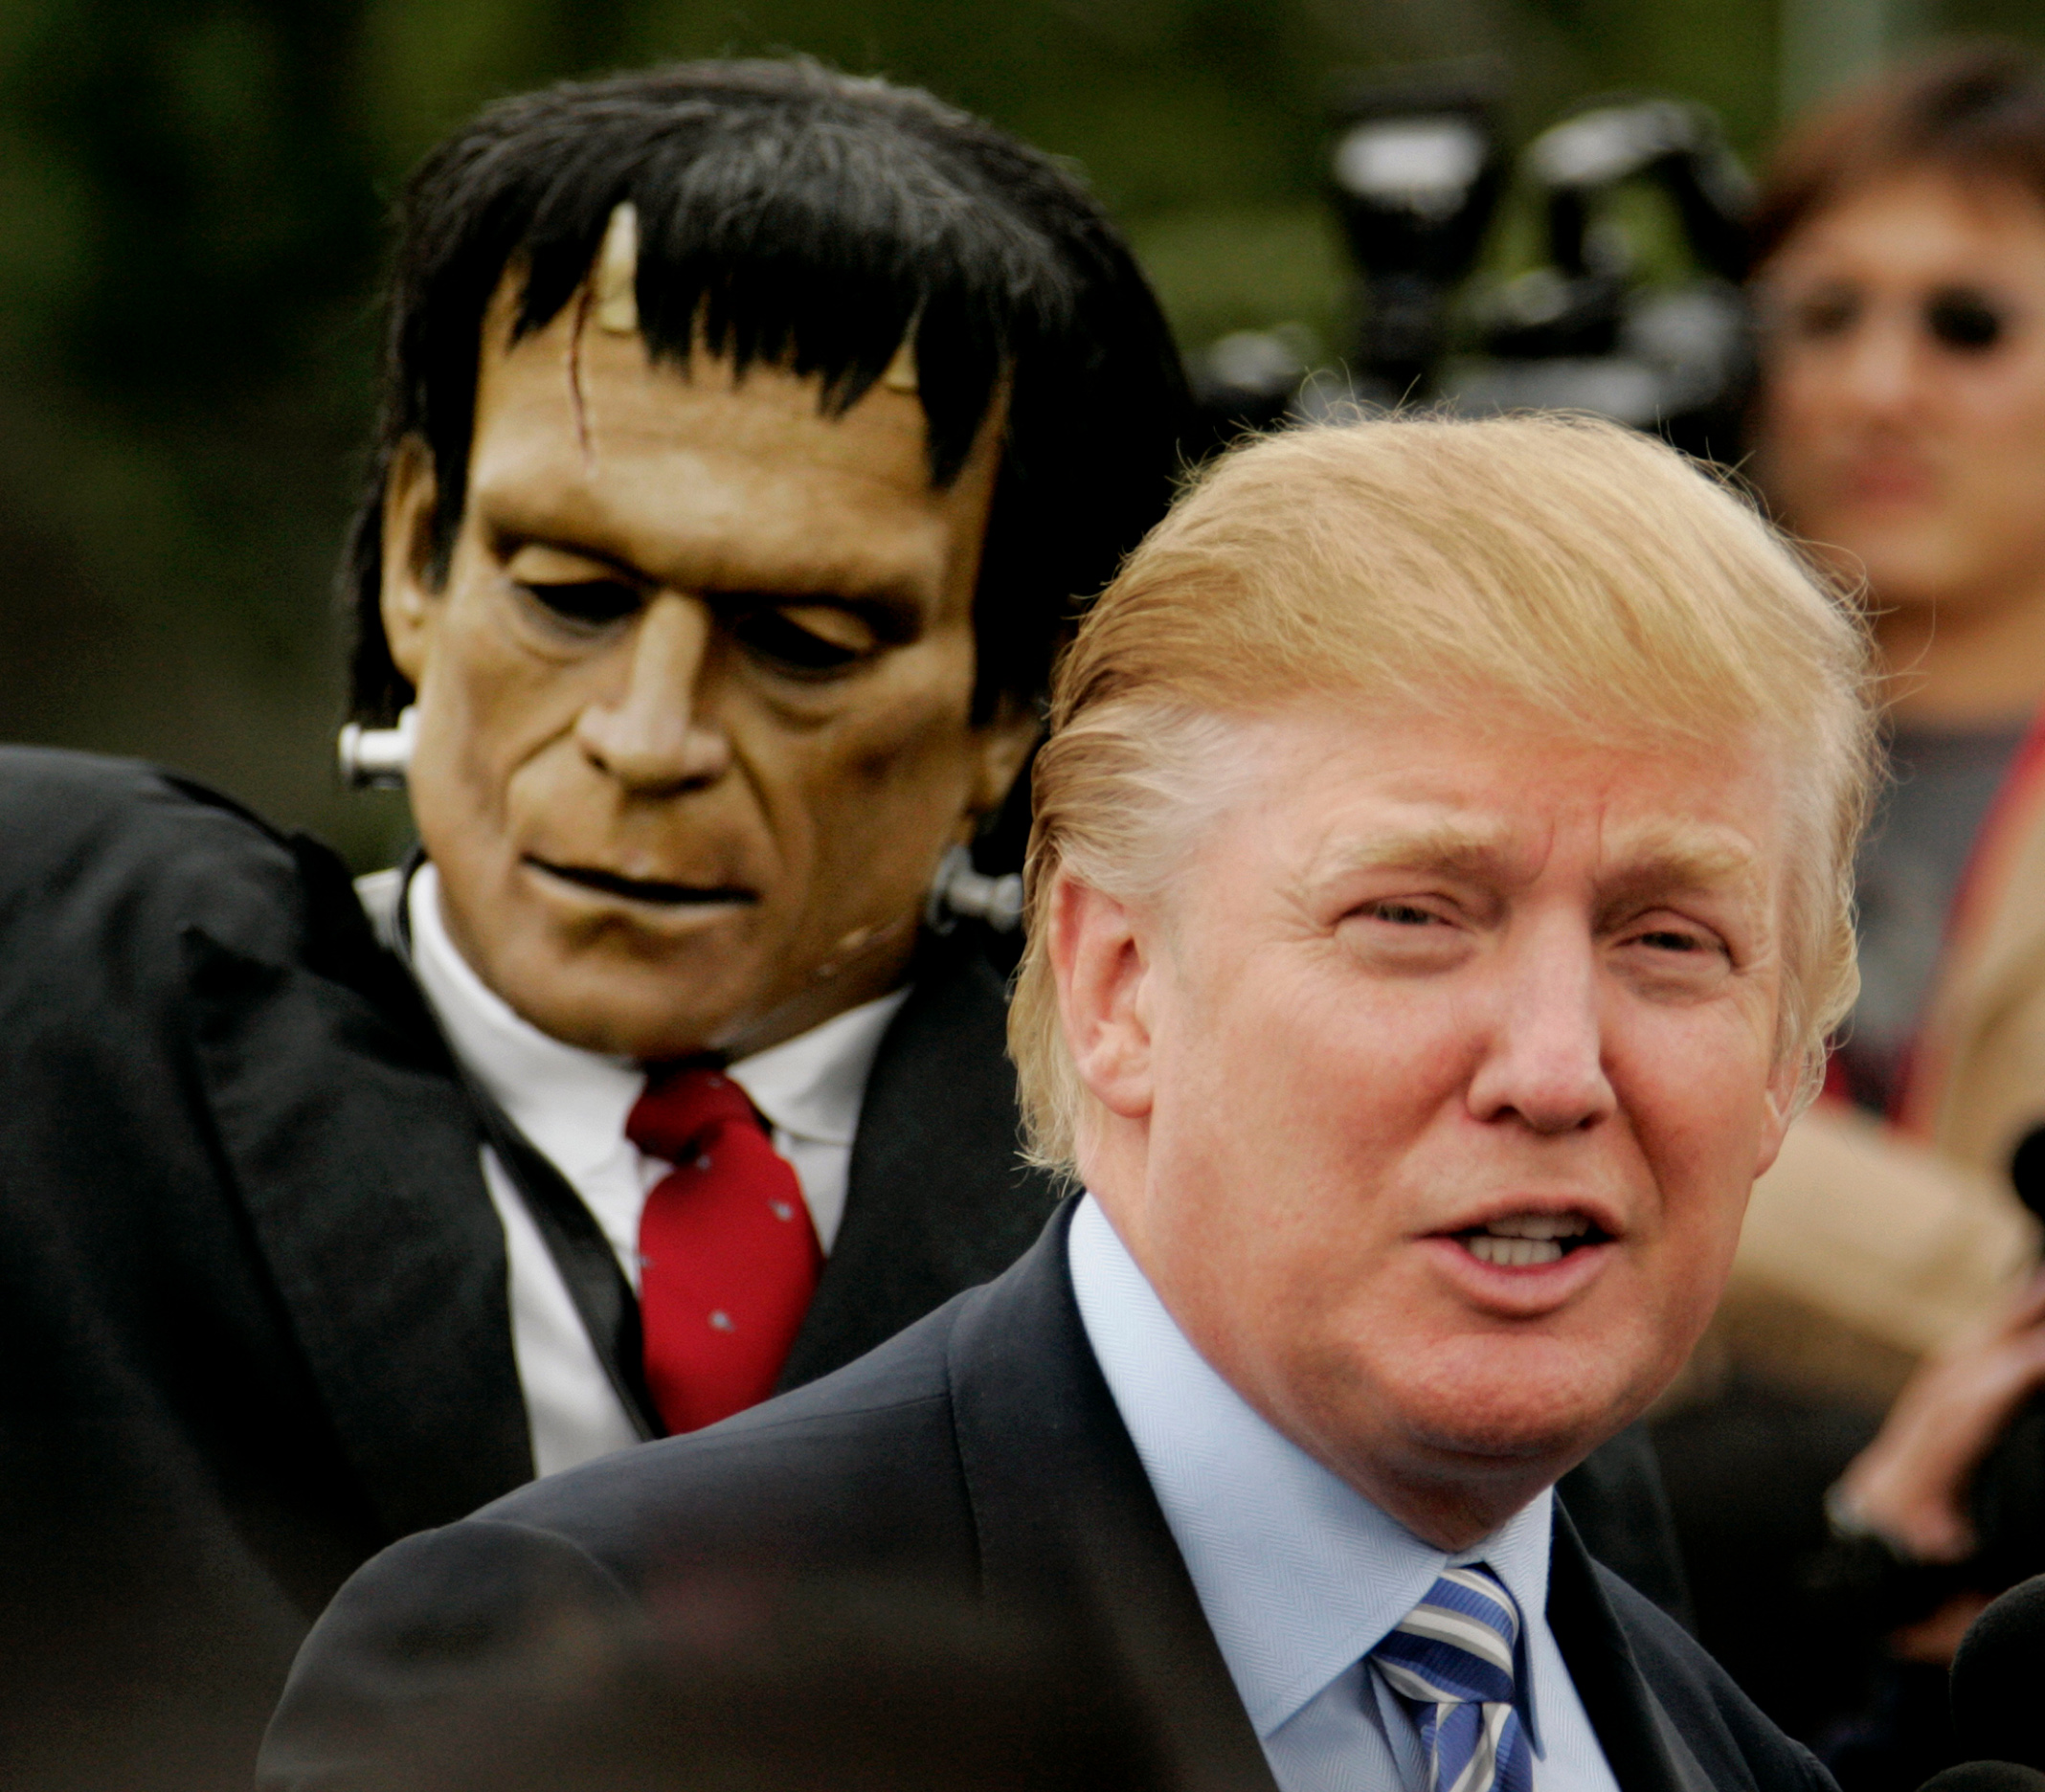 Donald Trump 2006.